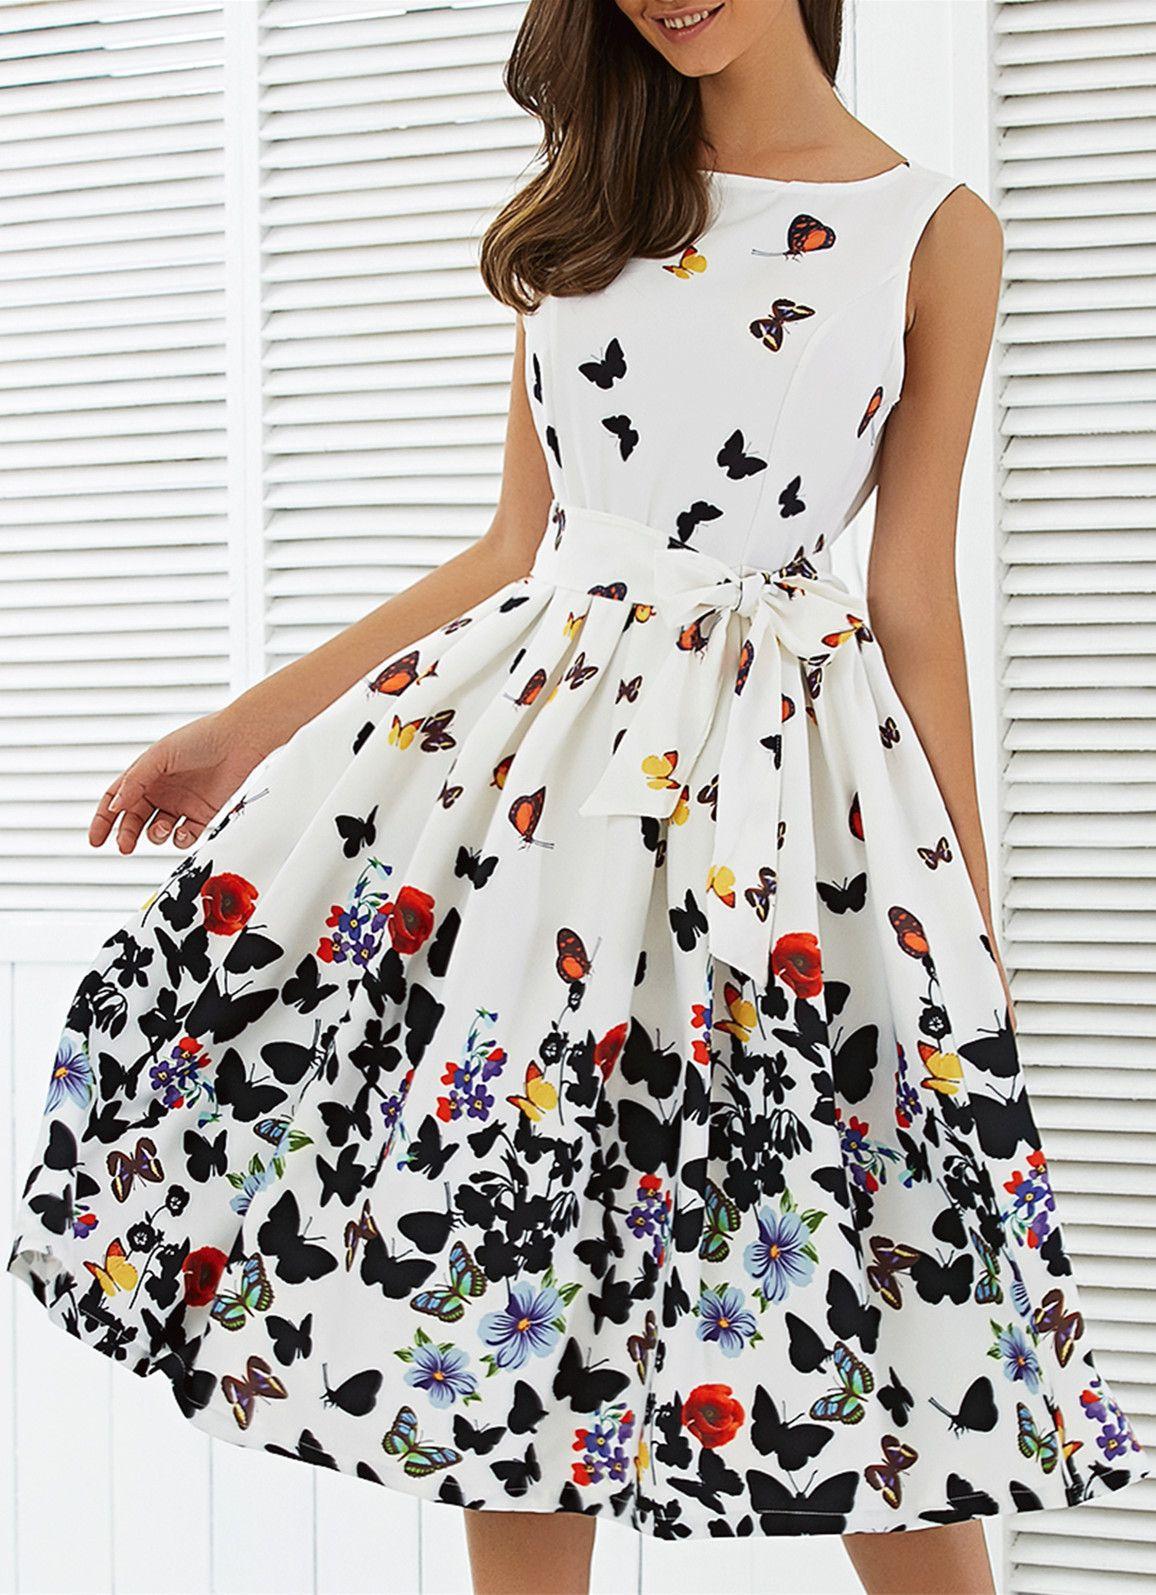 f81e2ea877 Sleeveless Floral Print Self Tie A Line Dress - White - 2xl ...